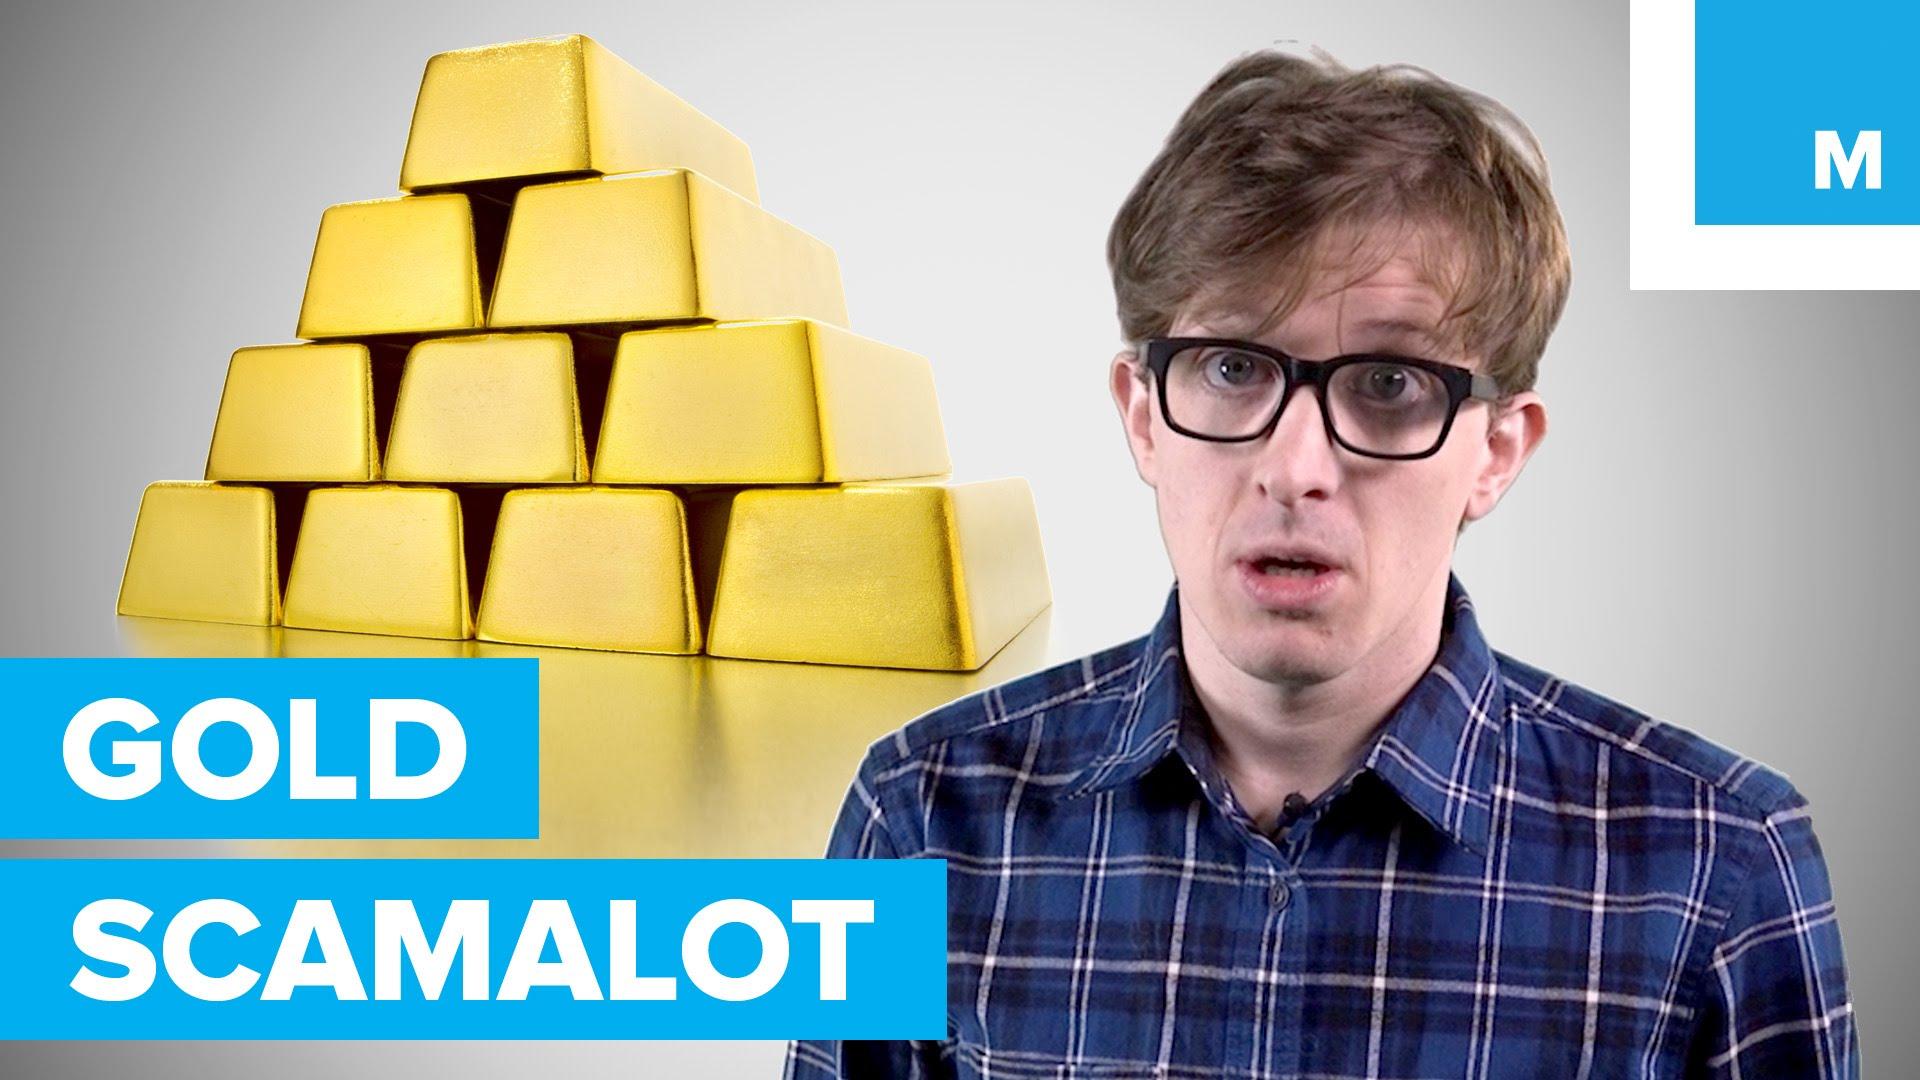 Gold | Scamalot